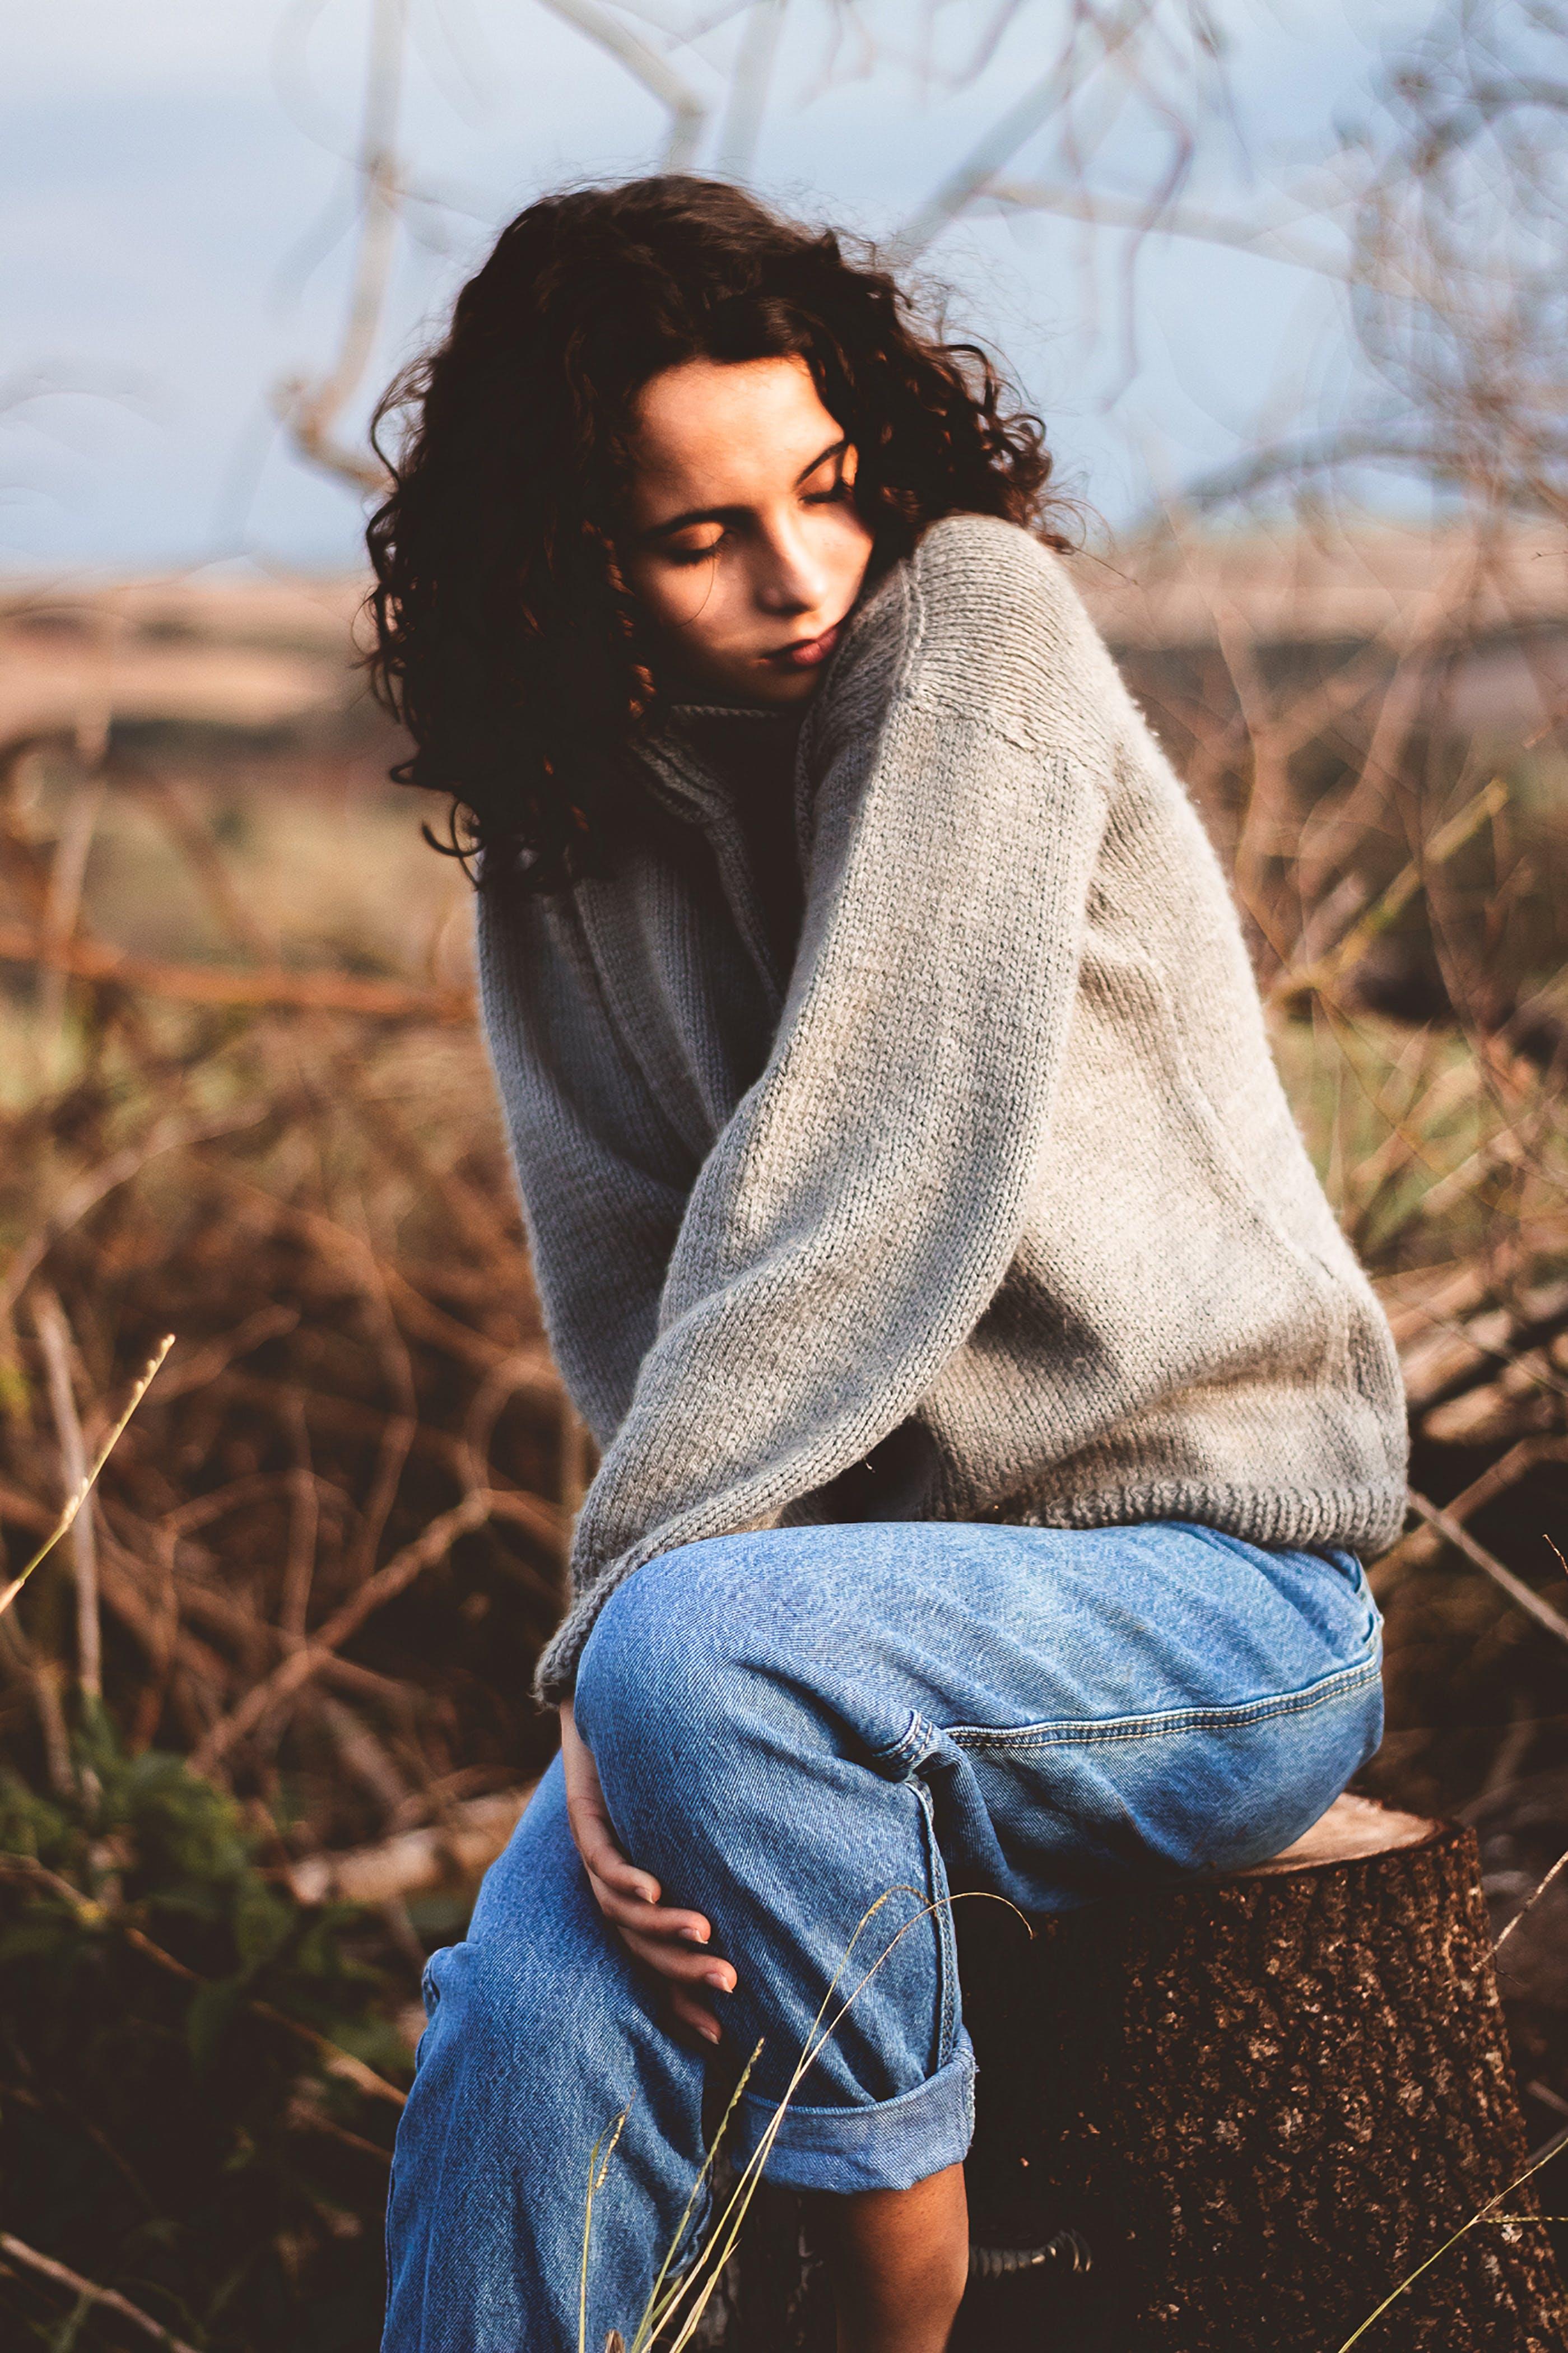 Free stock photo of beautiful girl, beautiful woman, blue jeans, brown hair